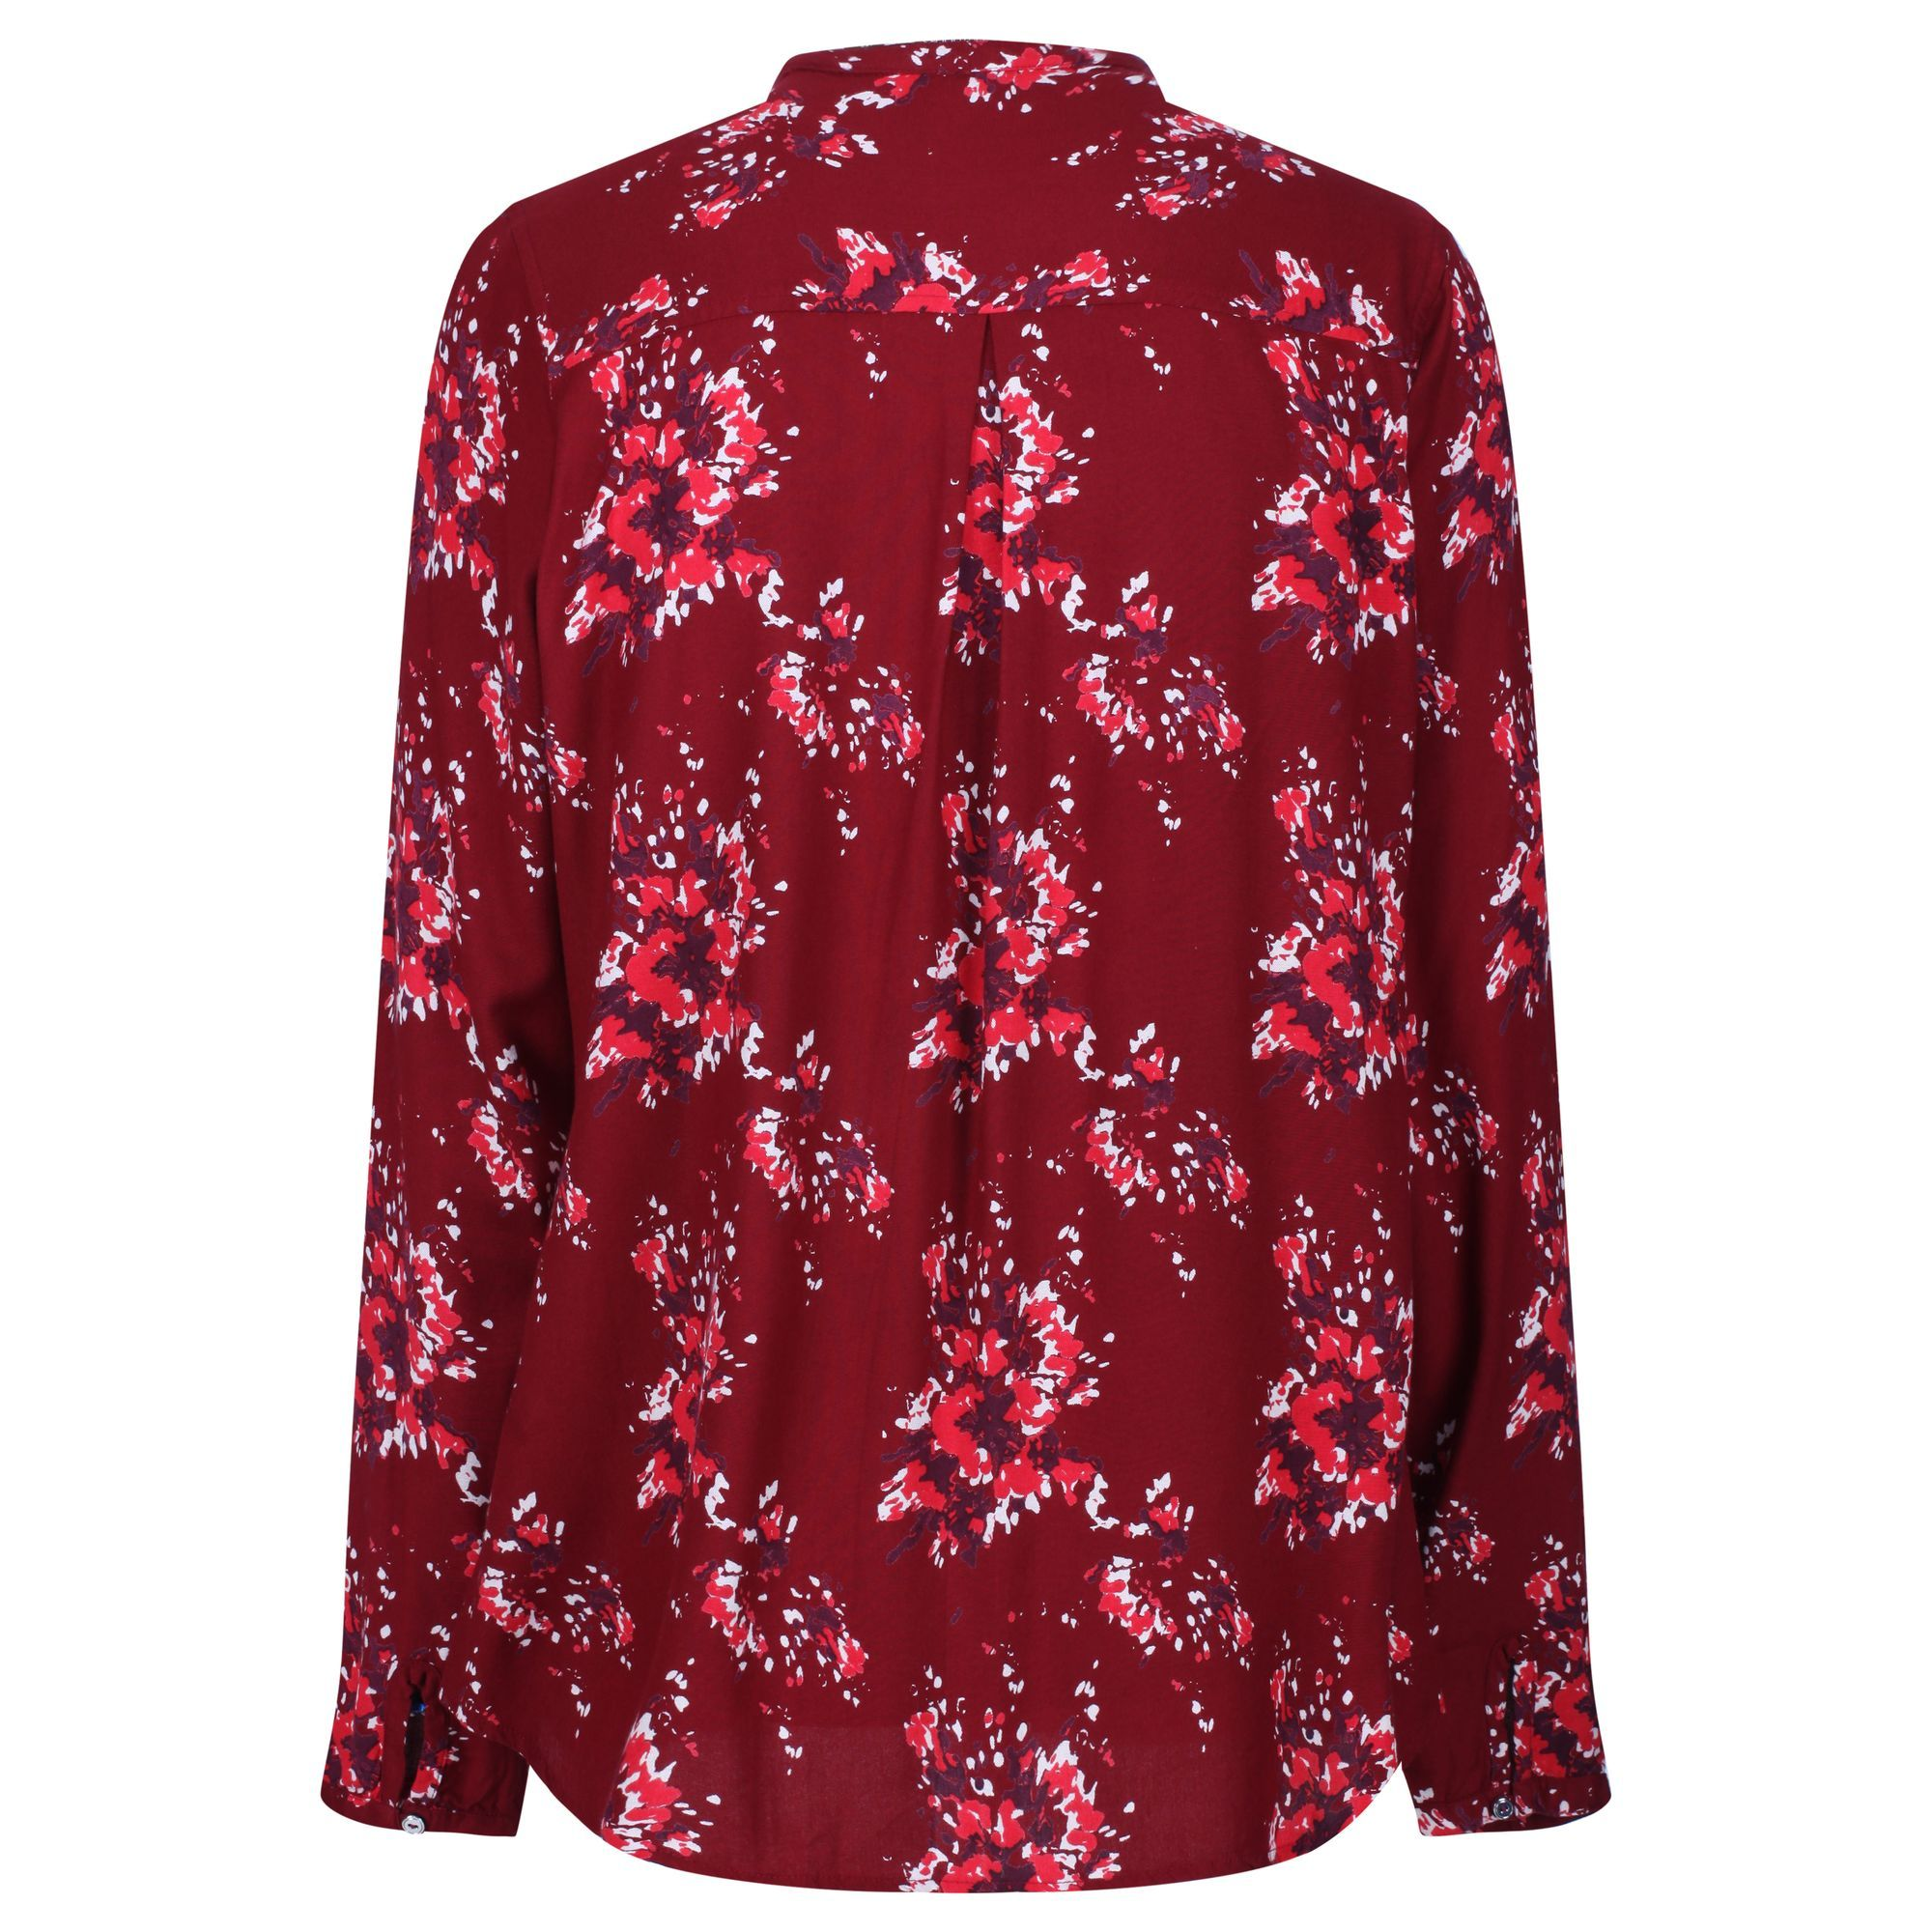 Regatta Great Outdoors Womens/Ladies Makala Printed Long Sleeve Shirt